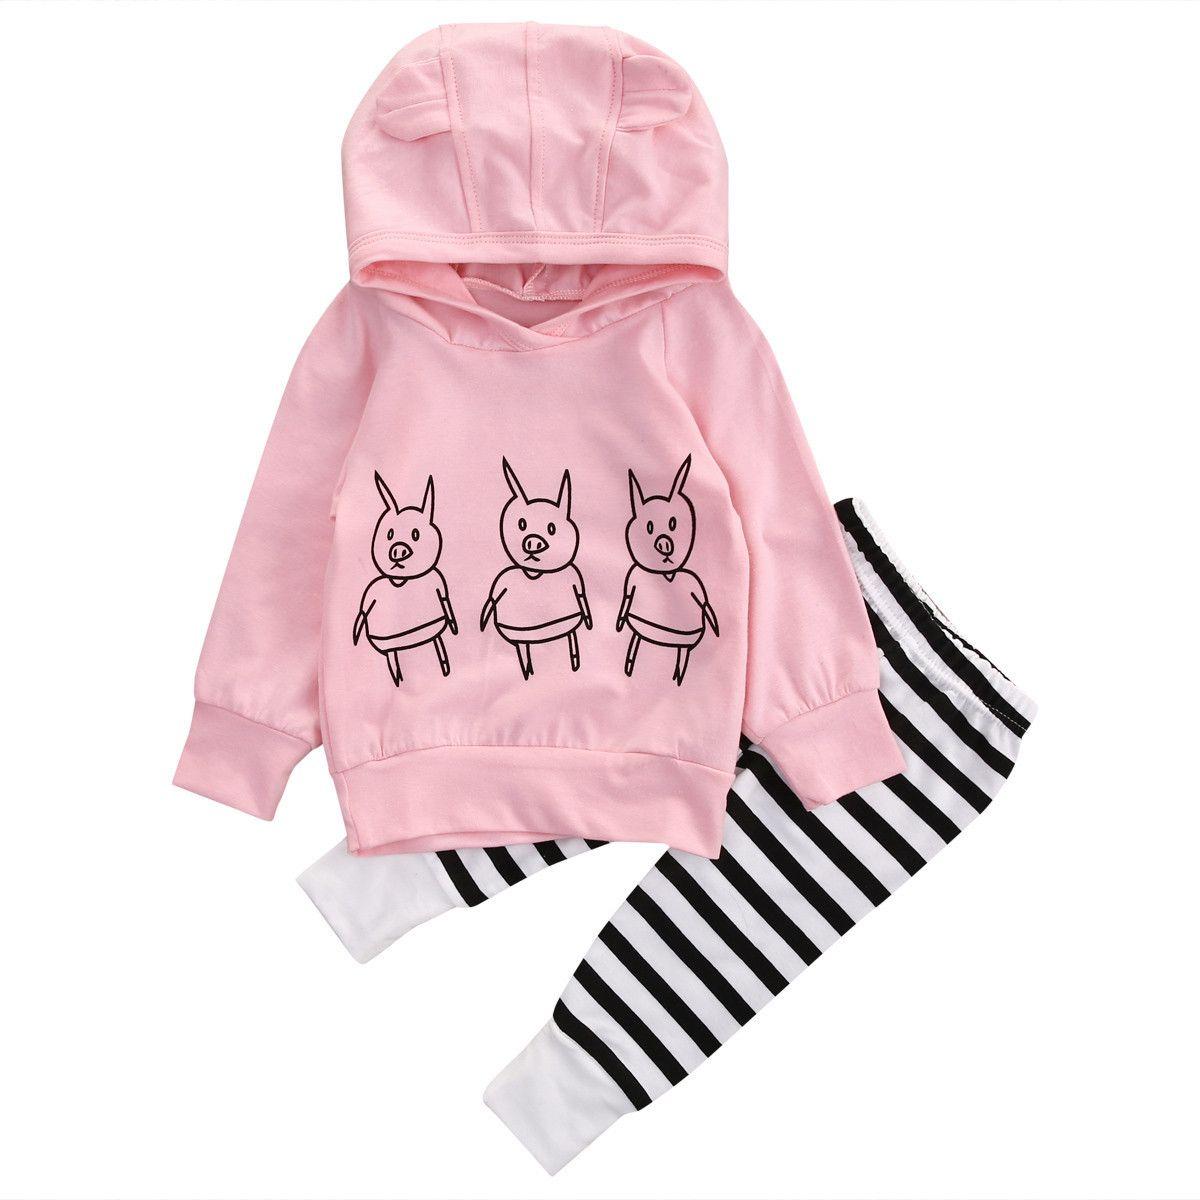 Compre Bebés Recién Nacidos Trajes Animales Cerdo Con Capucha Top + Pantalones  Polainas Niños Lindos Ropa Niño Manga Larga Boutique Niños Ropa 0 2Y A  7.2  ... e81e58d0bf70